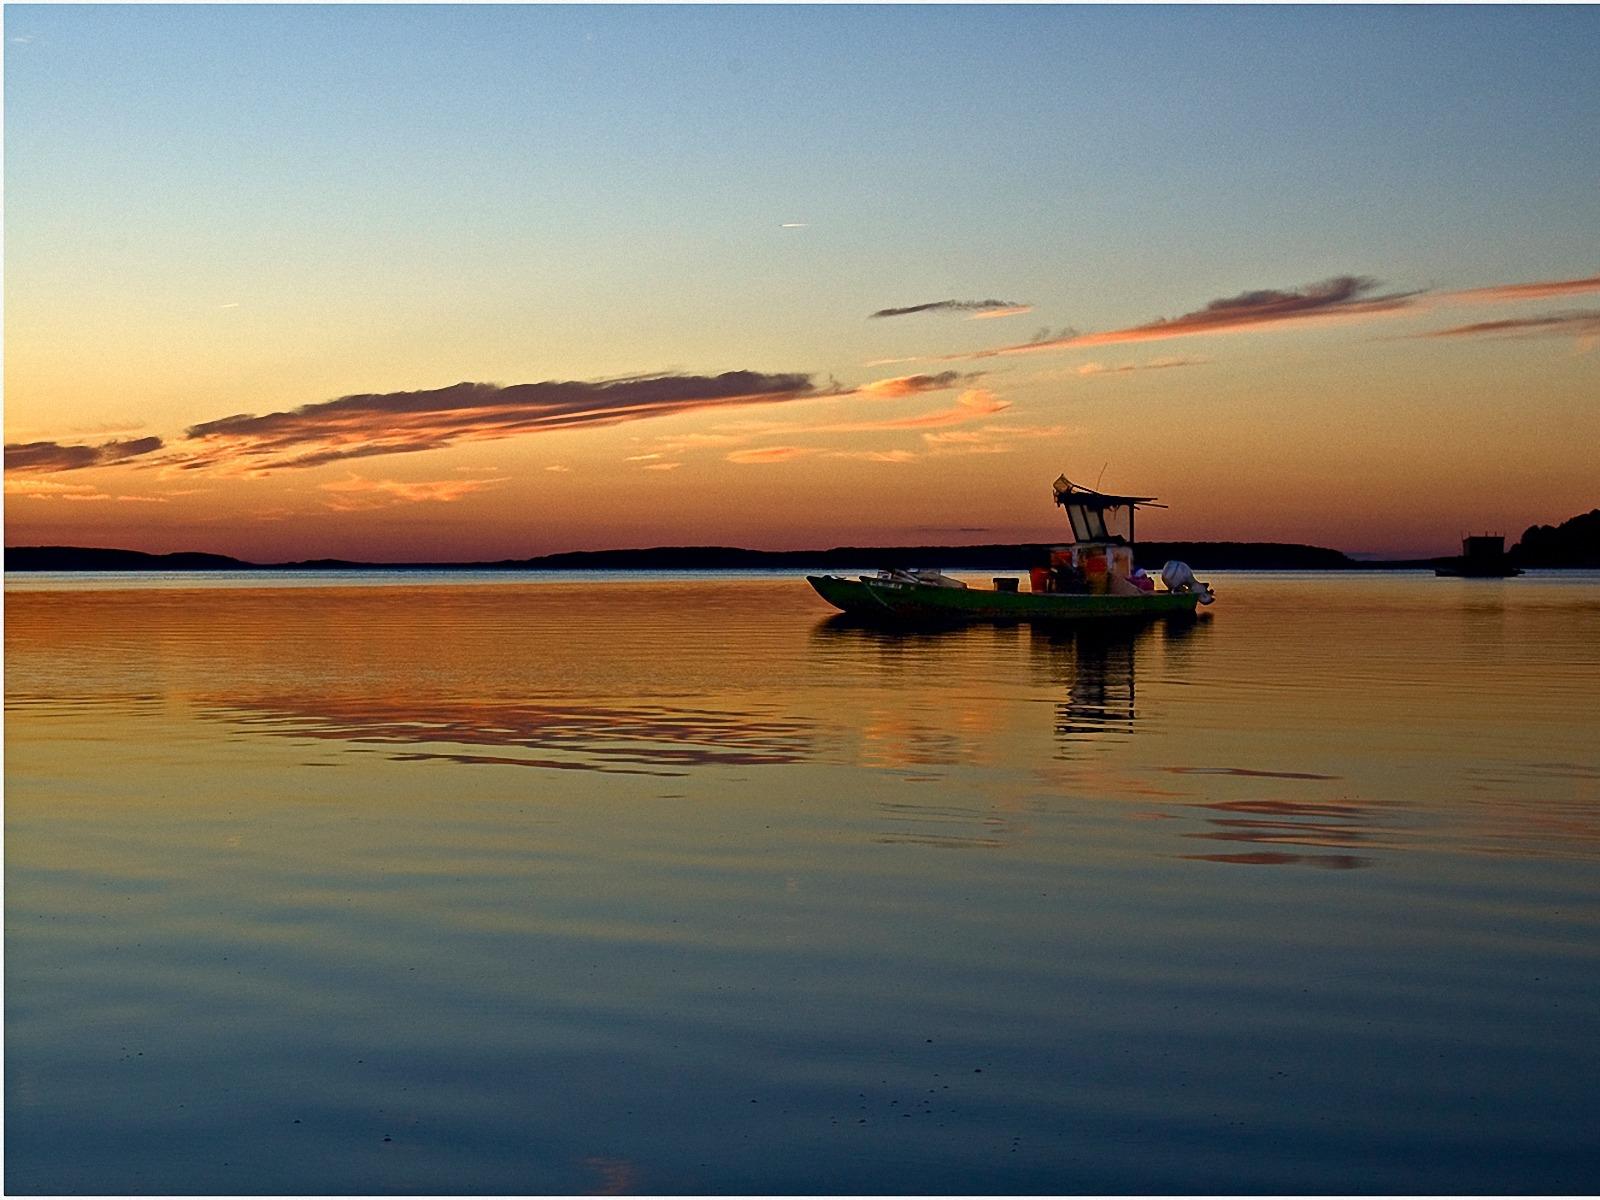 Cape Cod 1600x1200 WallpapersCape Cod National Seashore 1600x1200 1600x1200